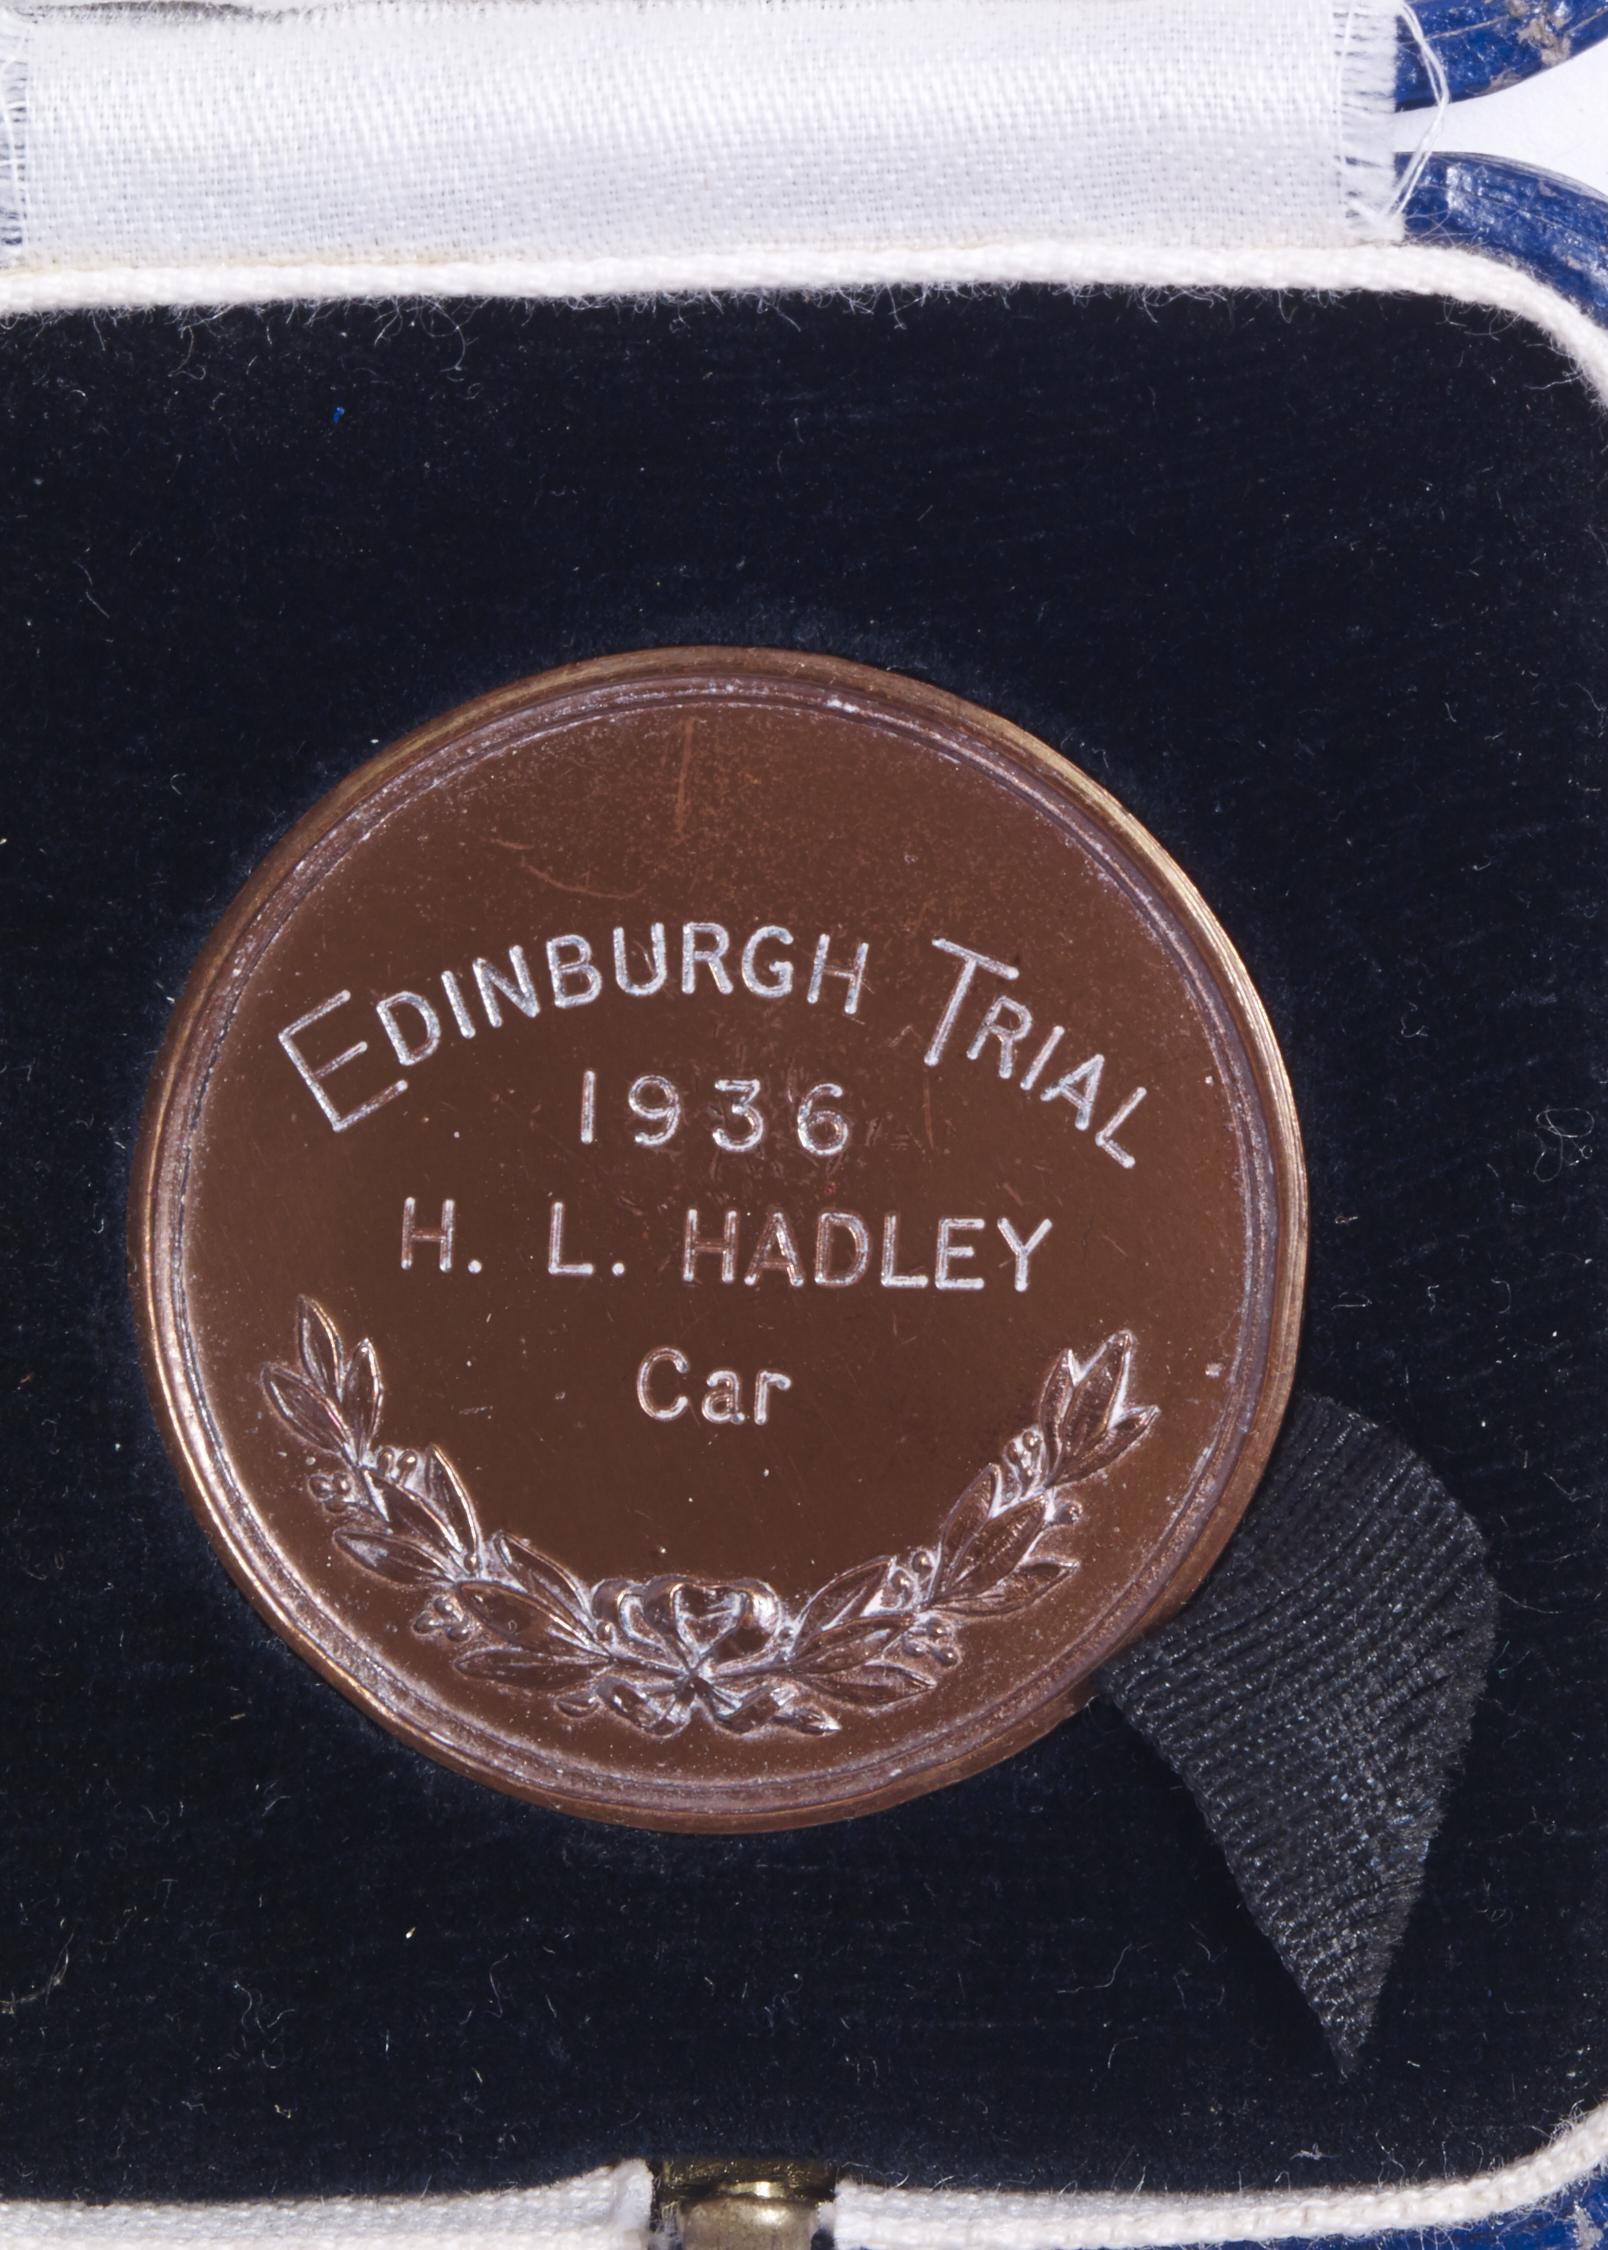 Edinburgh Trial - front Image